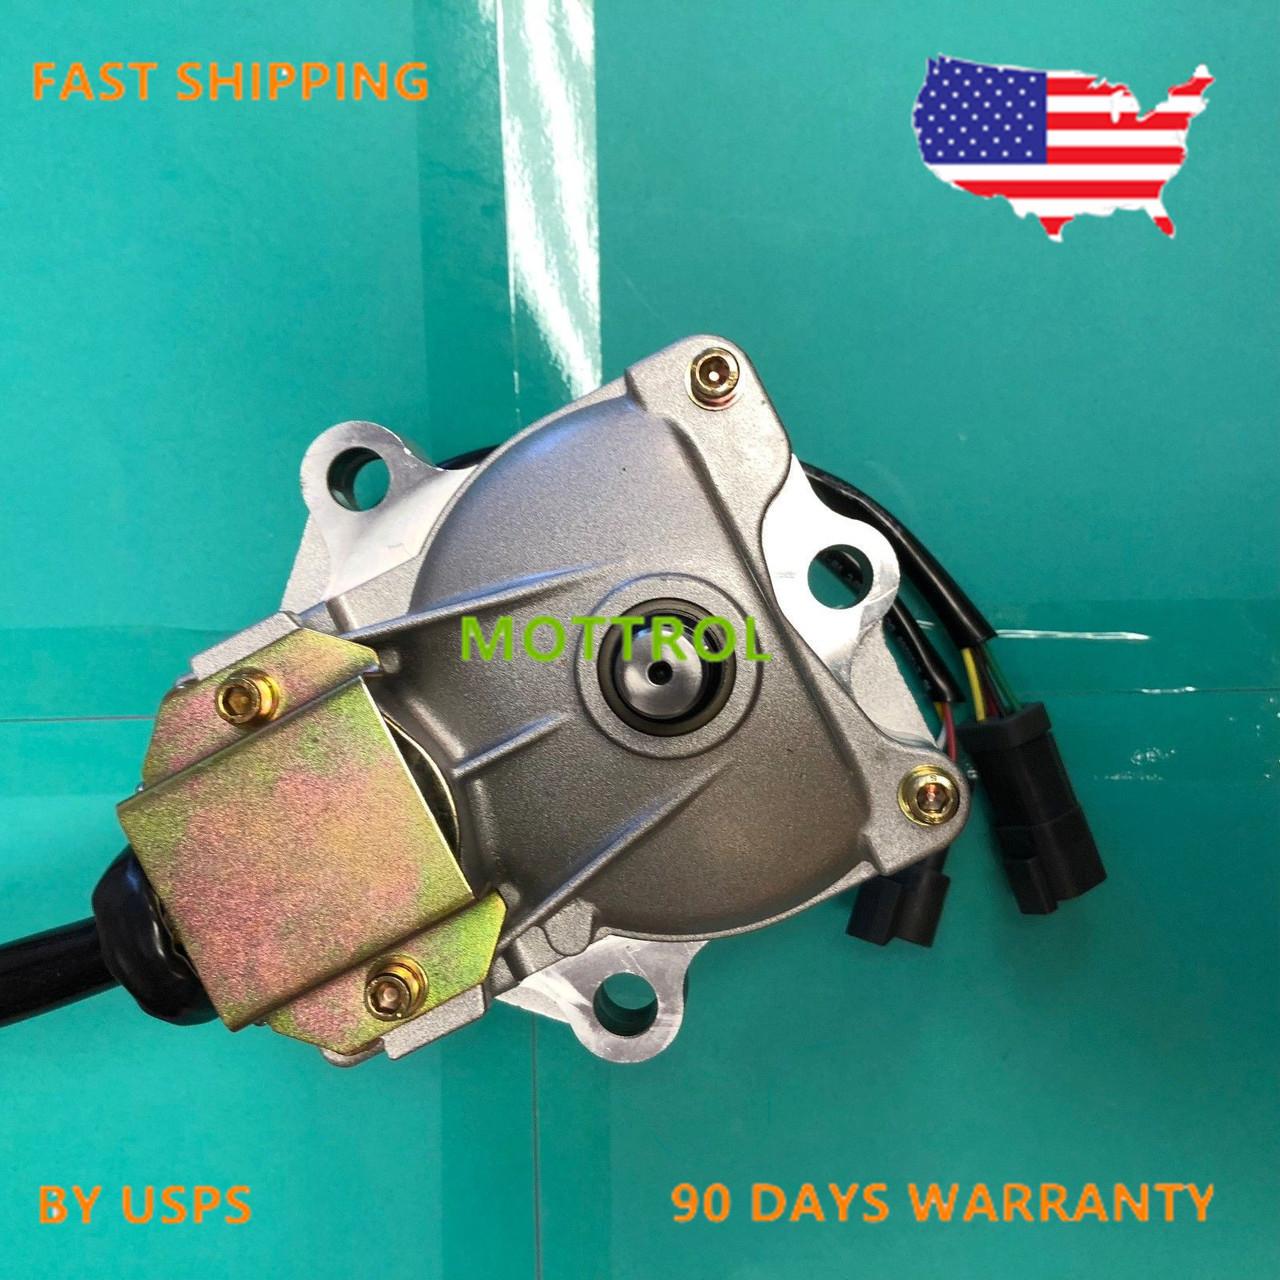 7834-40-3002 Stepper motor Throttle FIT KOMATSU PC1800-6 PC750-6 PC650-6 PC200-6